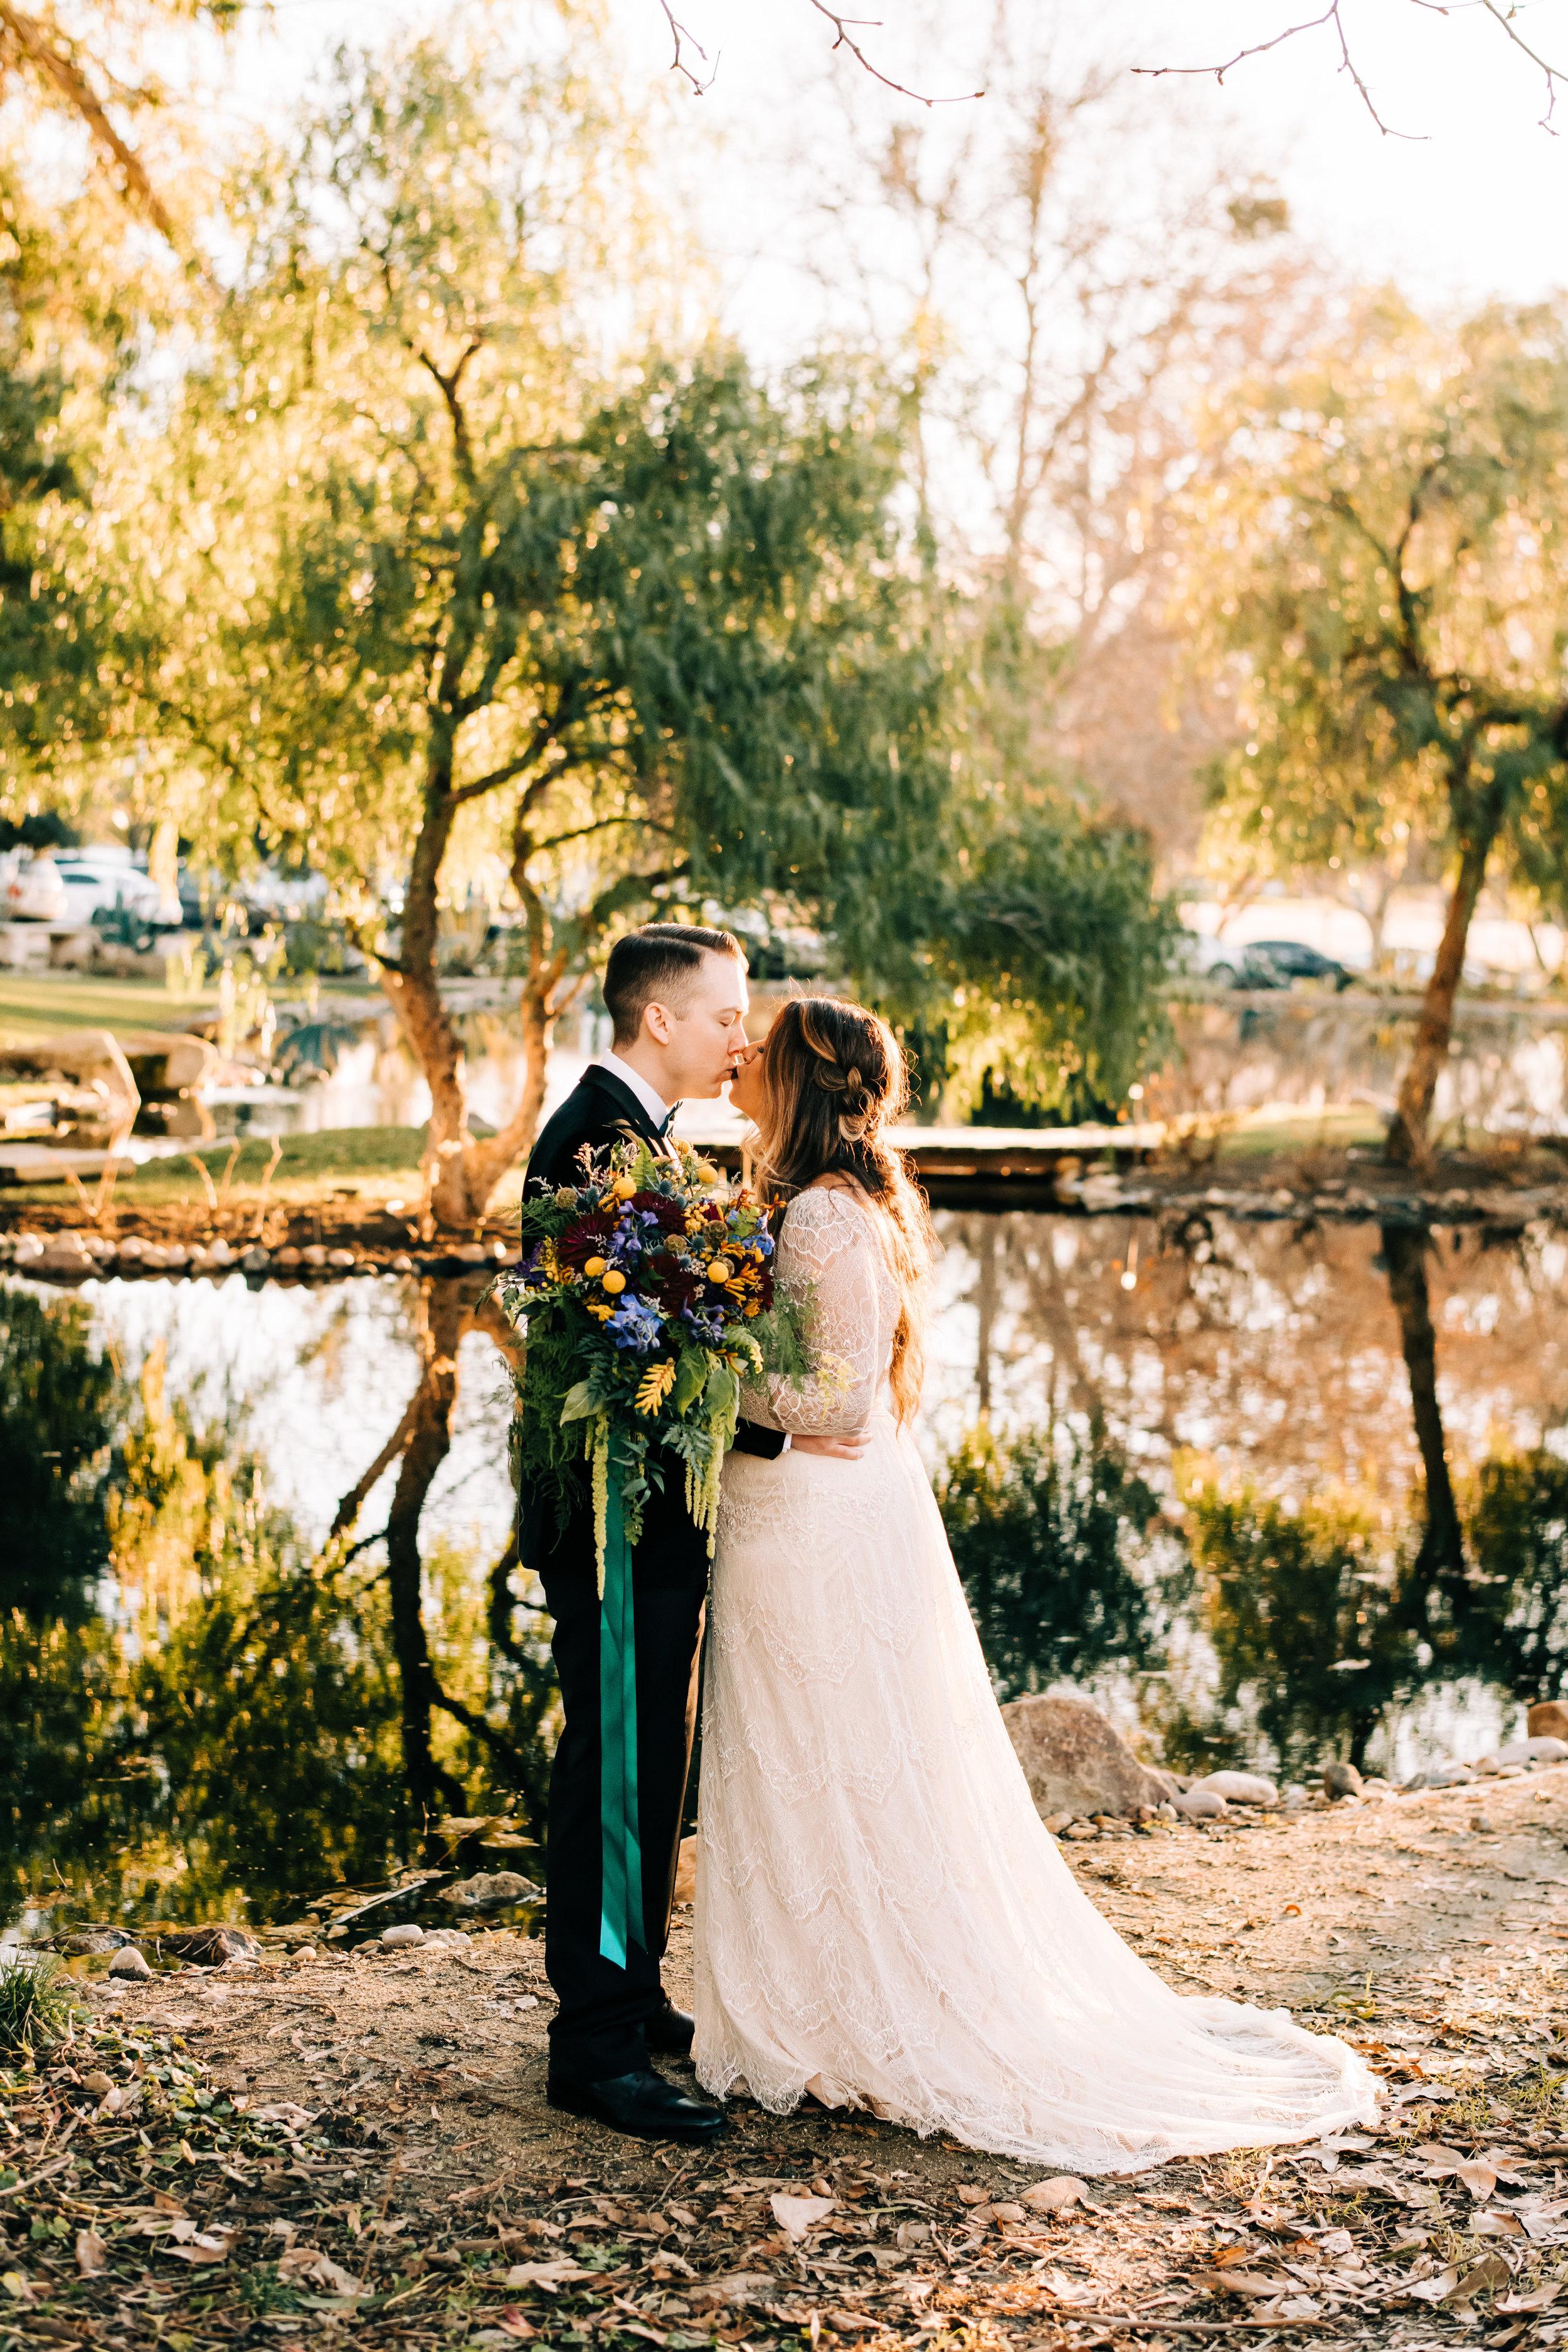 bay area nontraditional wedding photographer southern california boho wedding love light magic san francisco oakland northern california-786.jpg